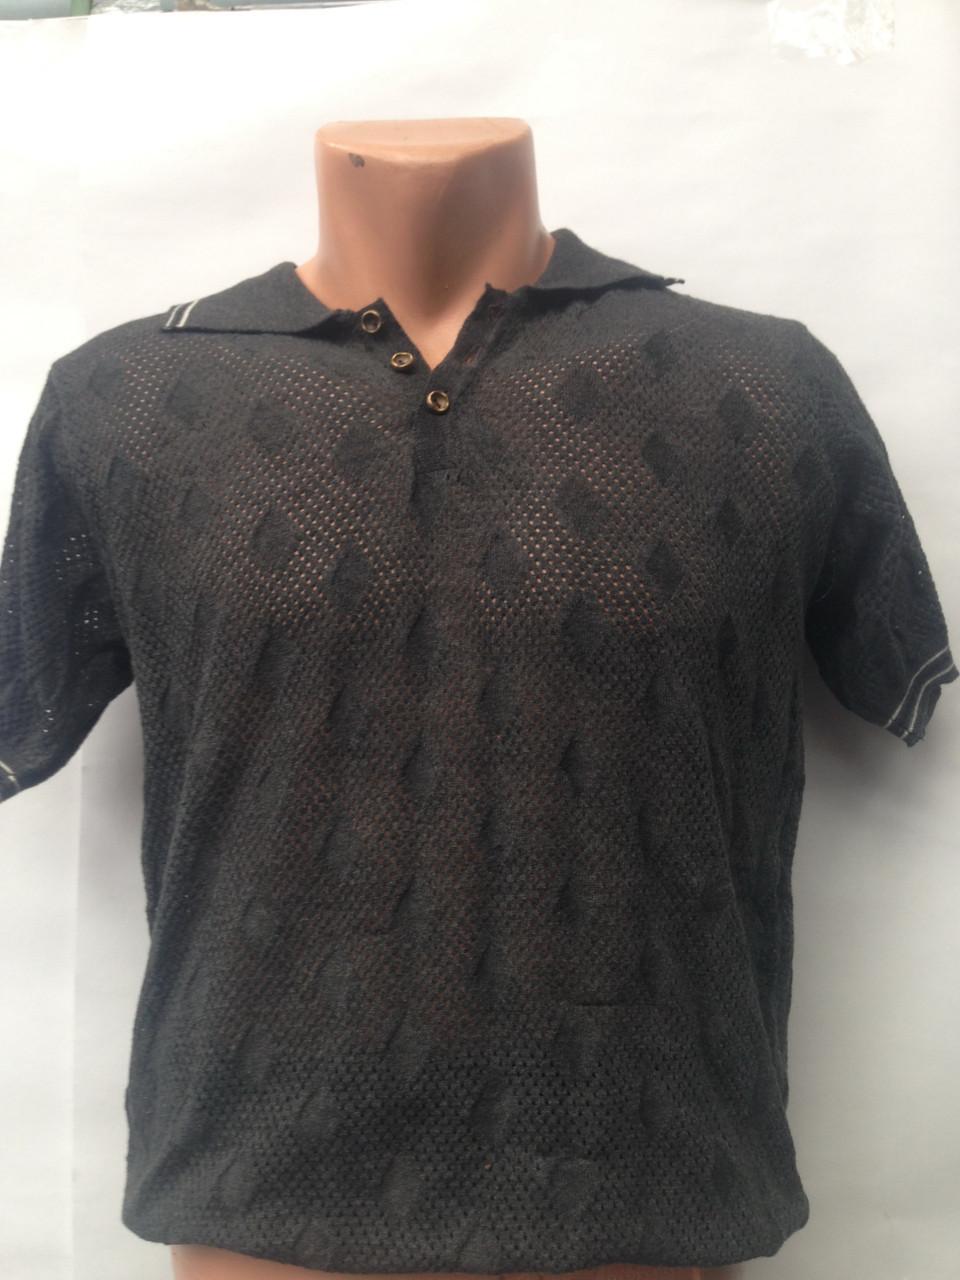 Мужская футболка сетка